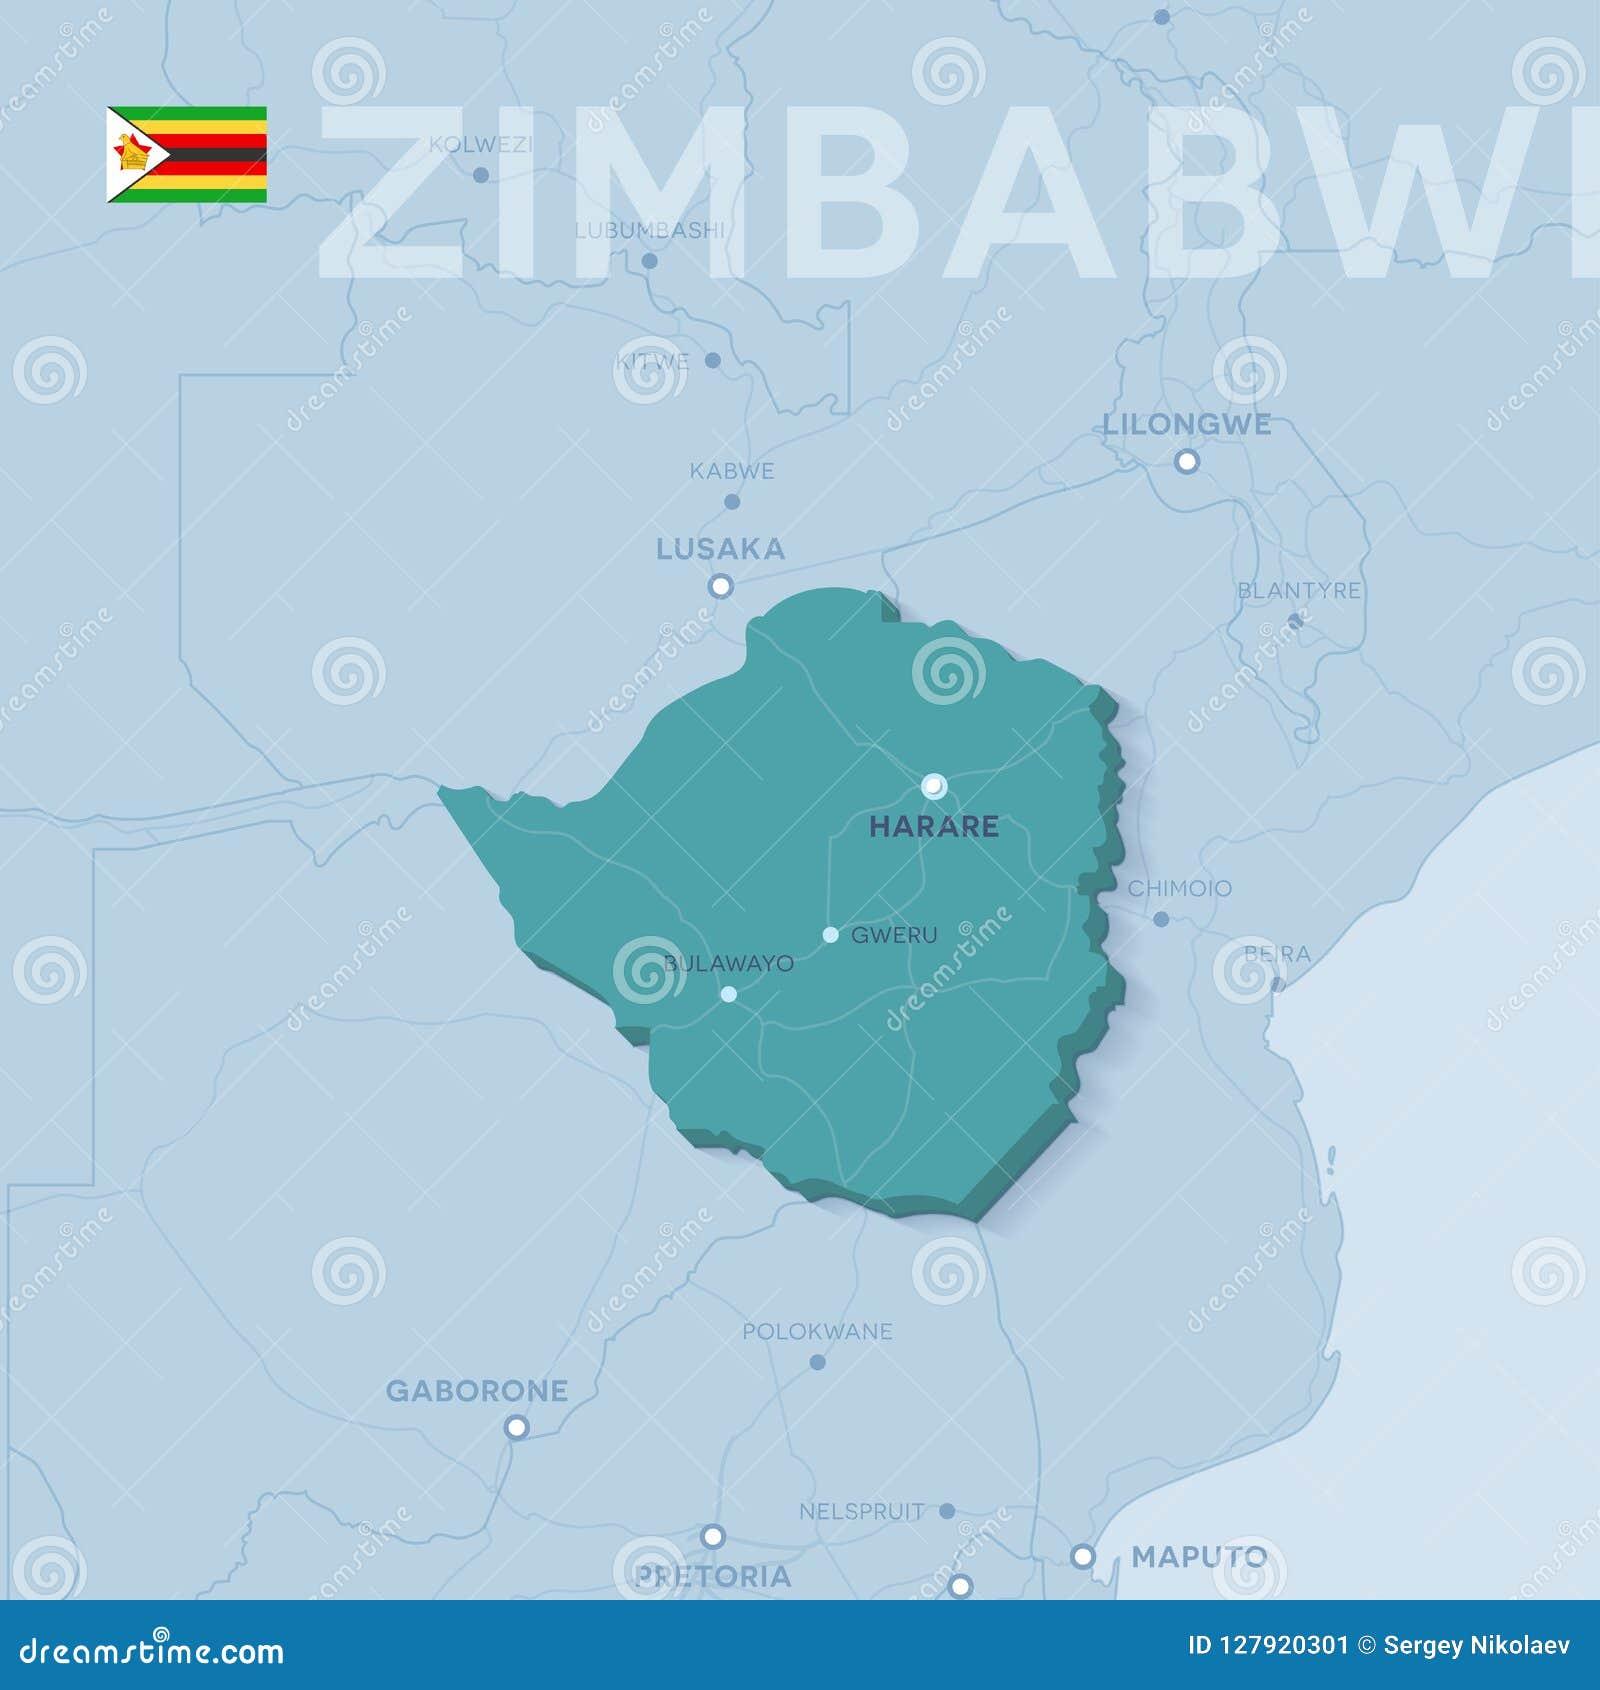 Map Of Africa Zimbabwe.Verctor Map Of Cities And Roads In Zimbabwe Stock Vector